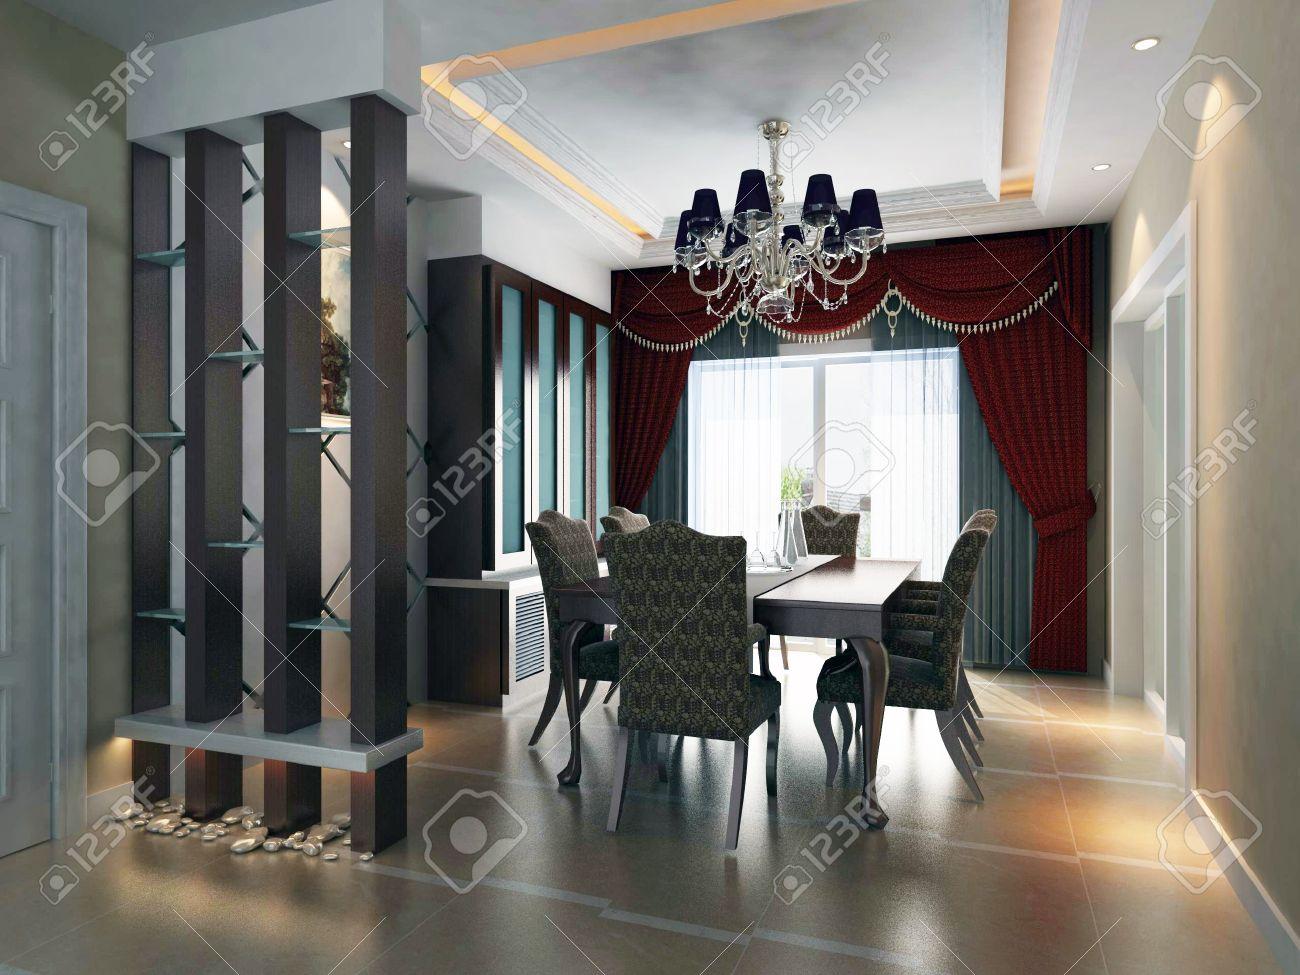 Emejing Sala Da Pranzo Design Photos - House Design Ideas 2018 ...